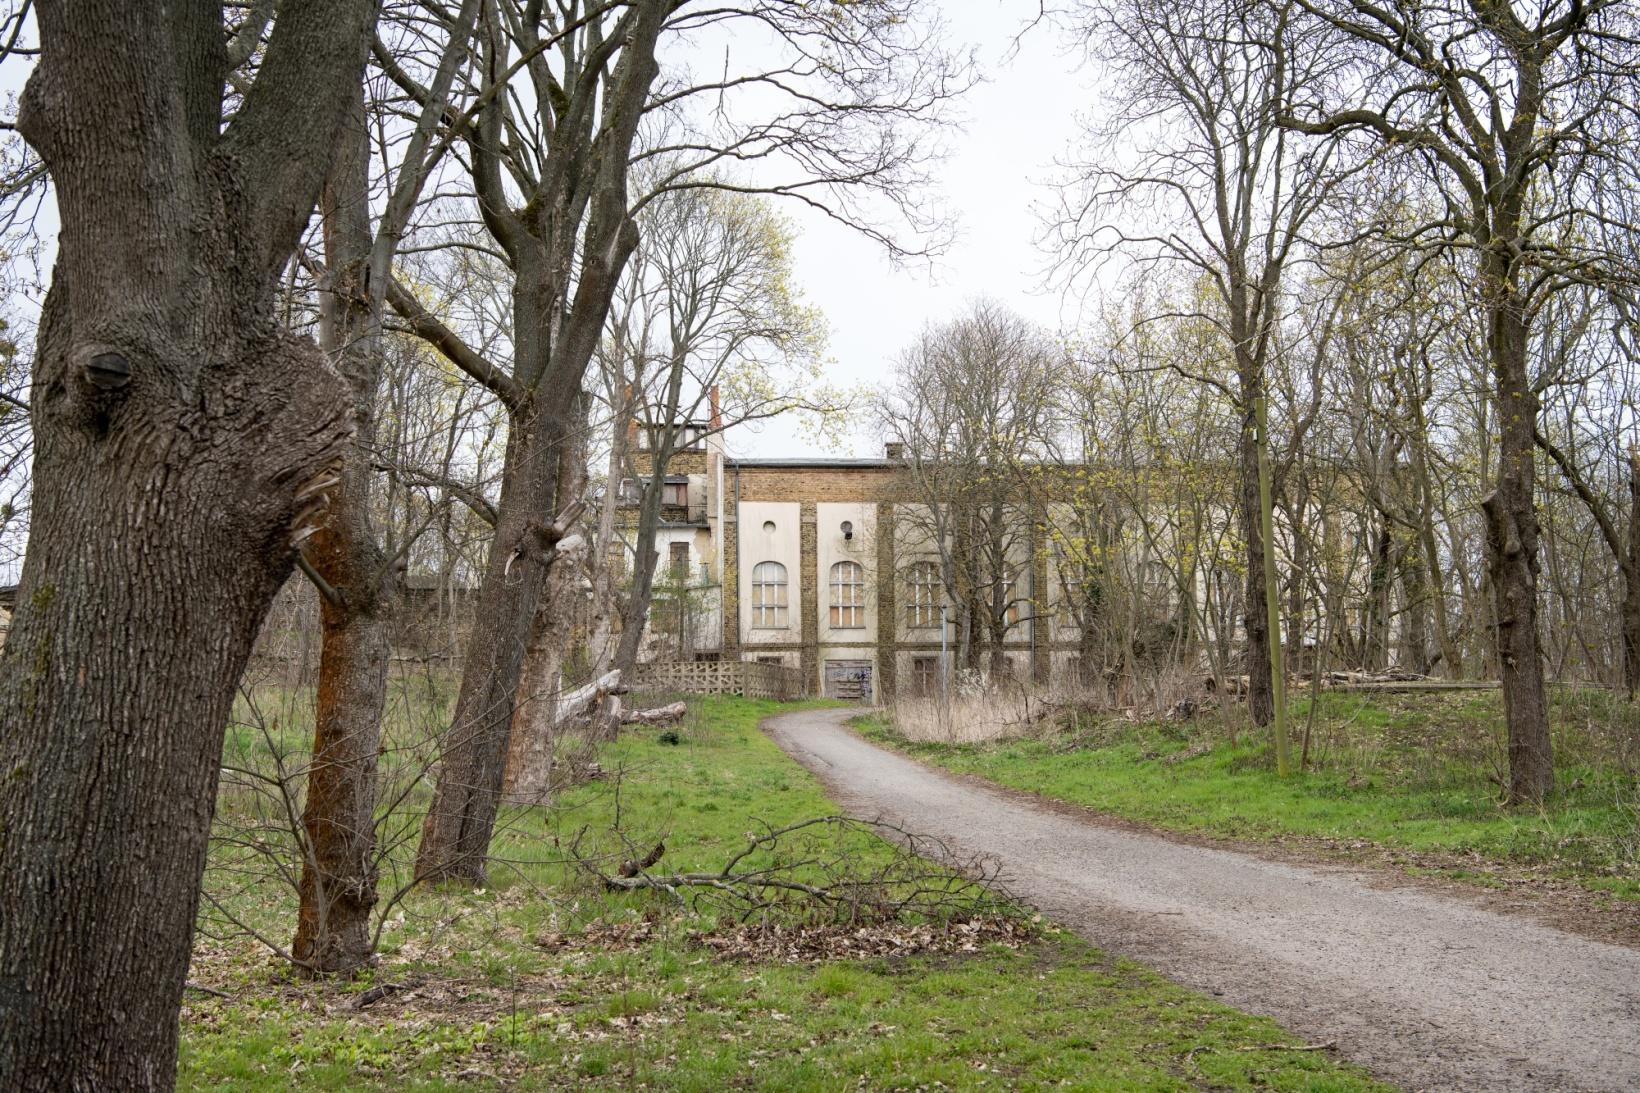 German Property Group